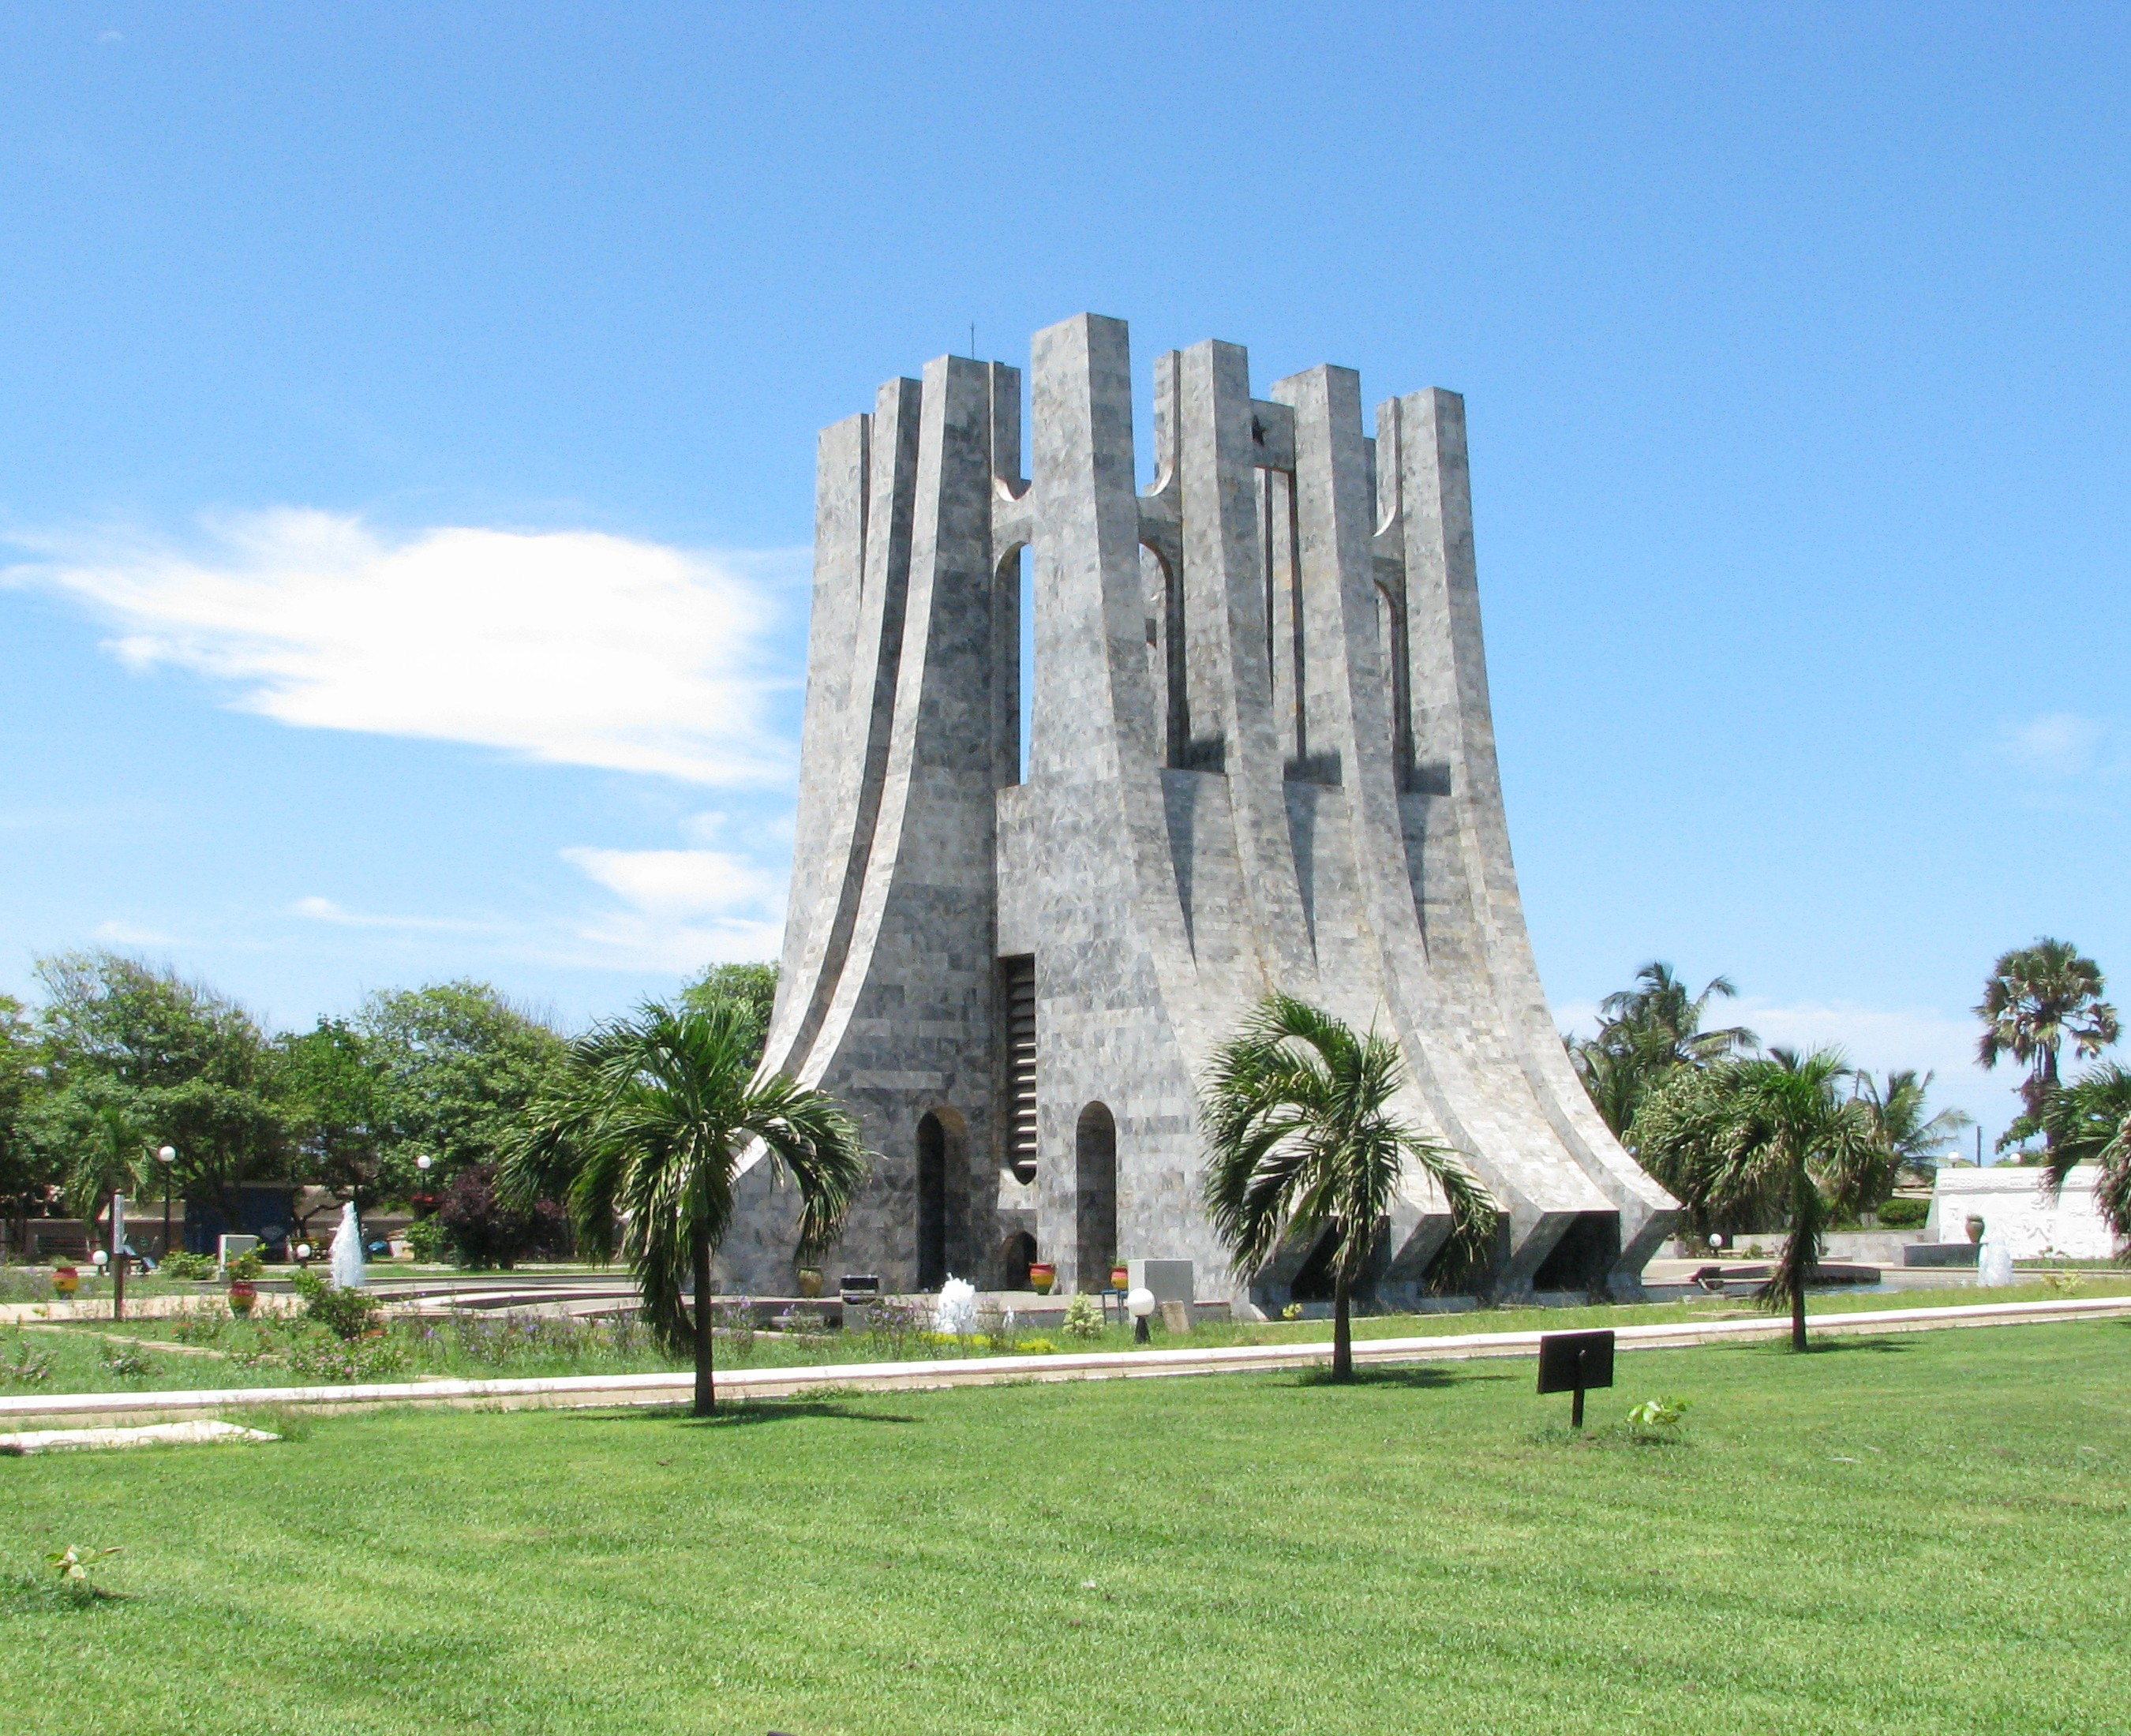 Kwame Nkrumah Mausoleum, Ghana